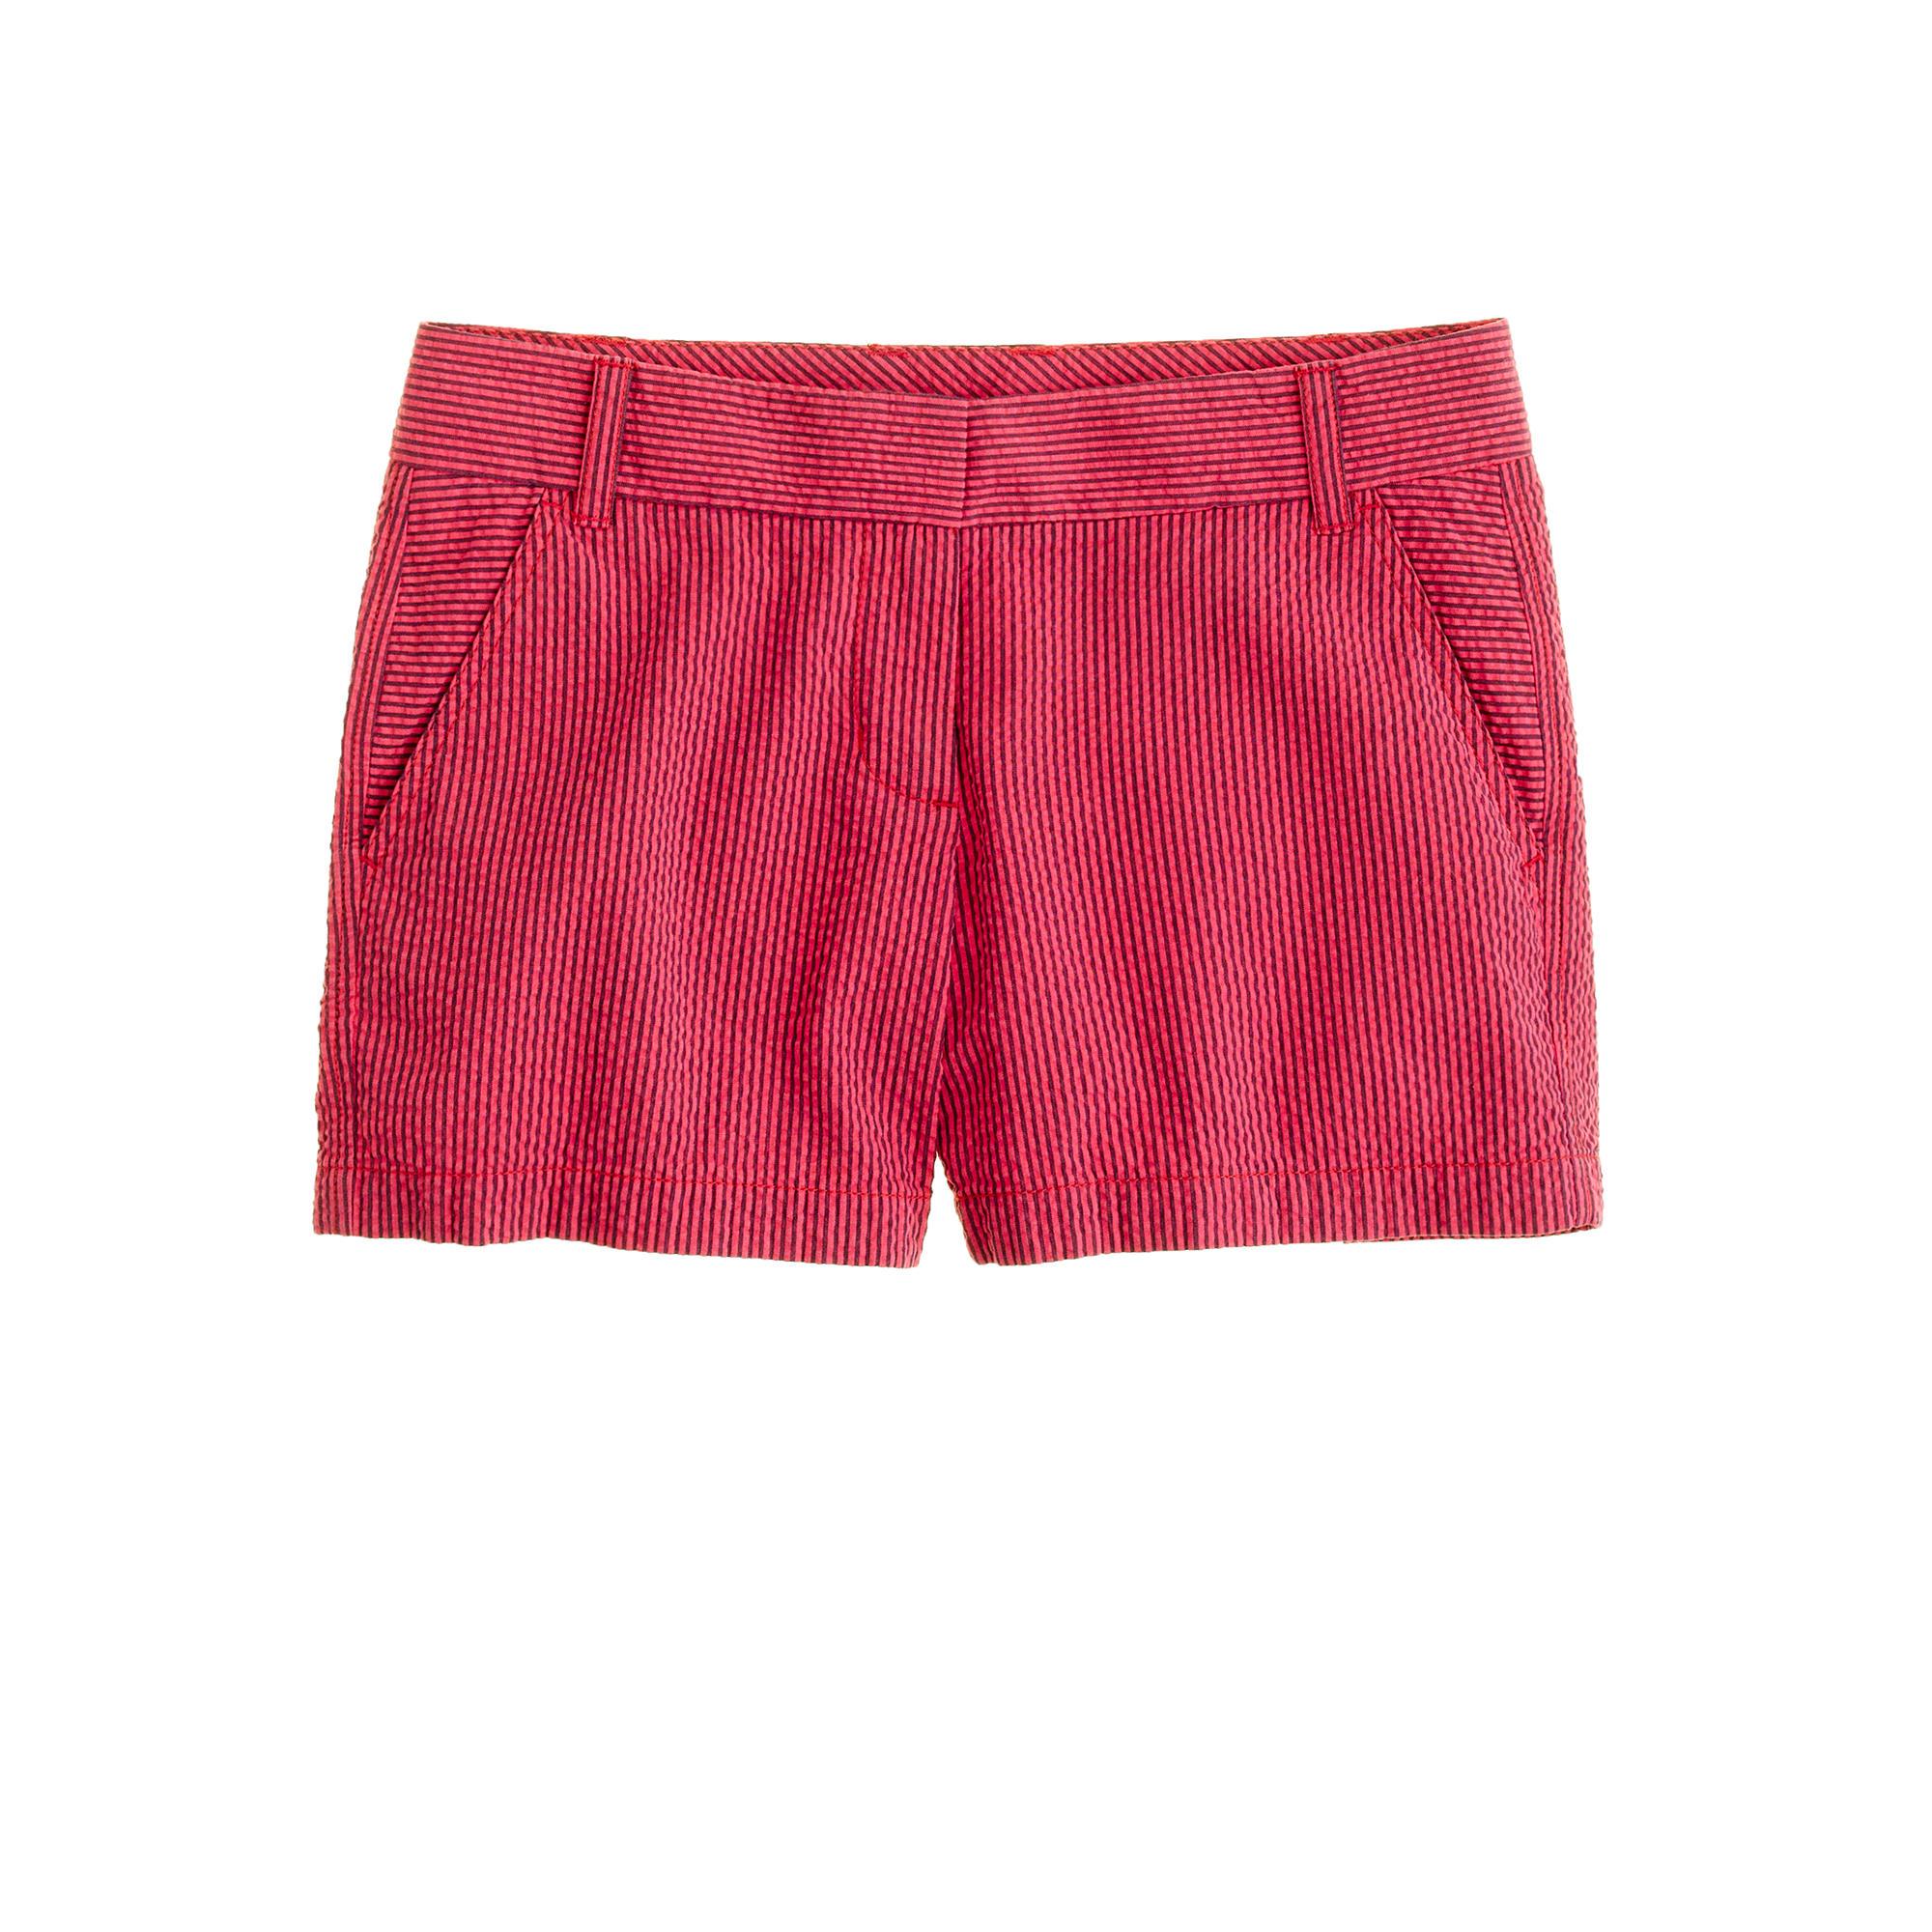 Based in NewYork, aqui-tarjetas.ml is a specialty retailer offering premium clothing and accessories for women, men and children. Customers attribute aqui-tarjetas.ml's success to .